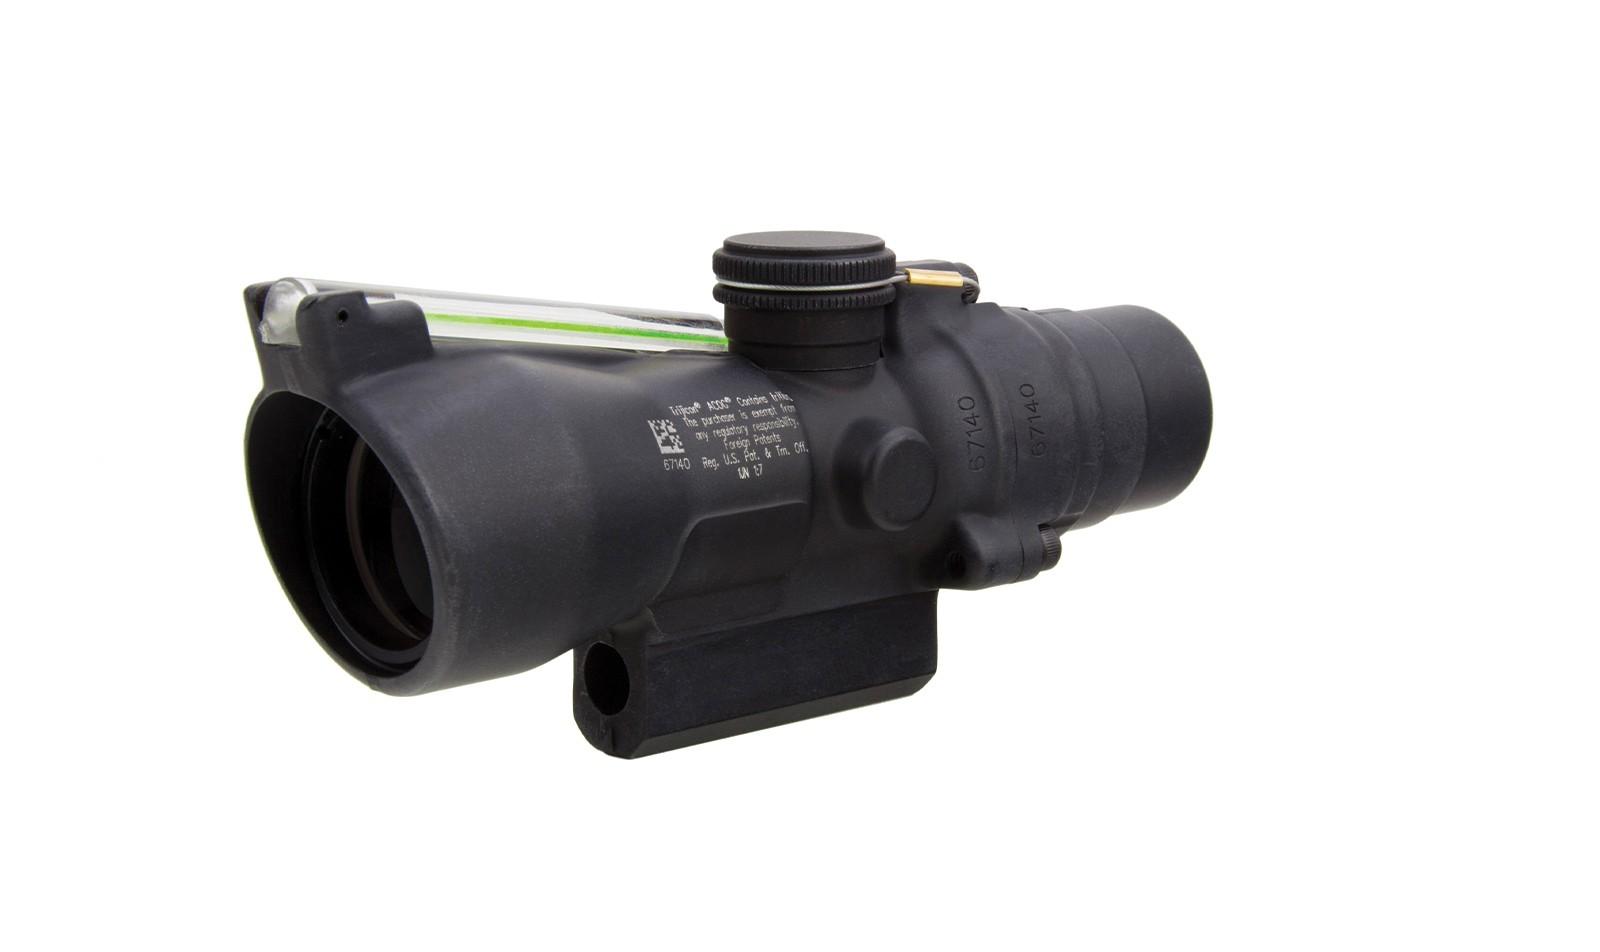 Trijicon ACOG® 3x24 XB Crossbow Scope - 400 - 440+fps